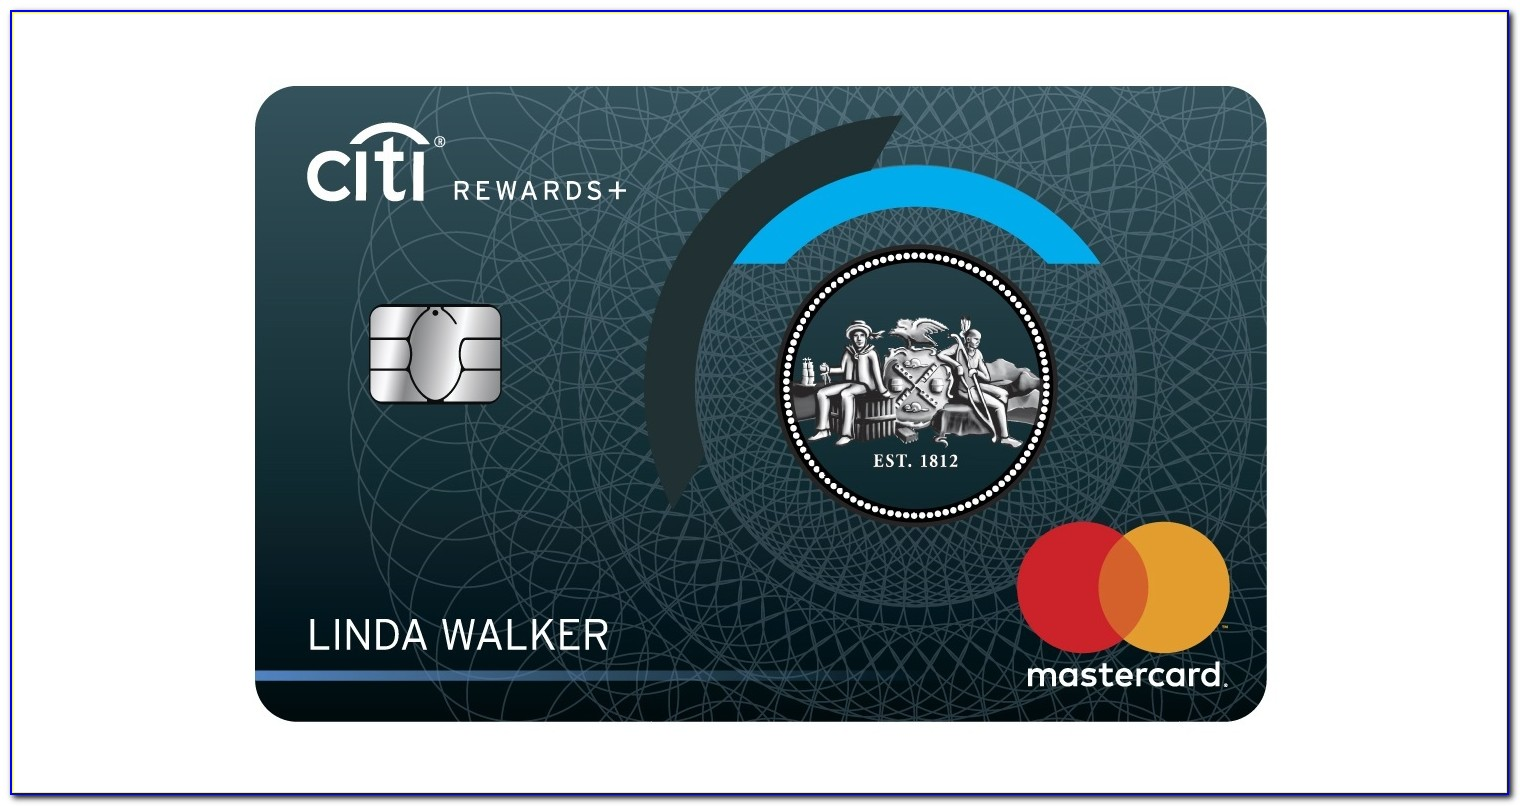 Citi Credit Card Invitation Number